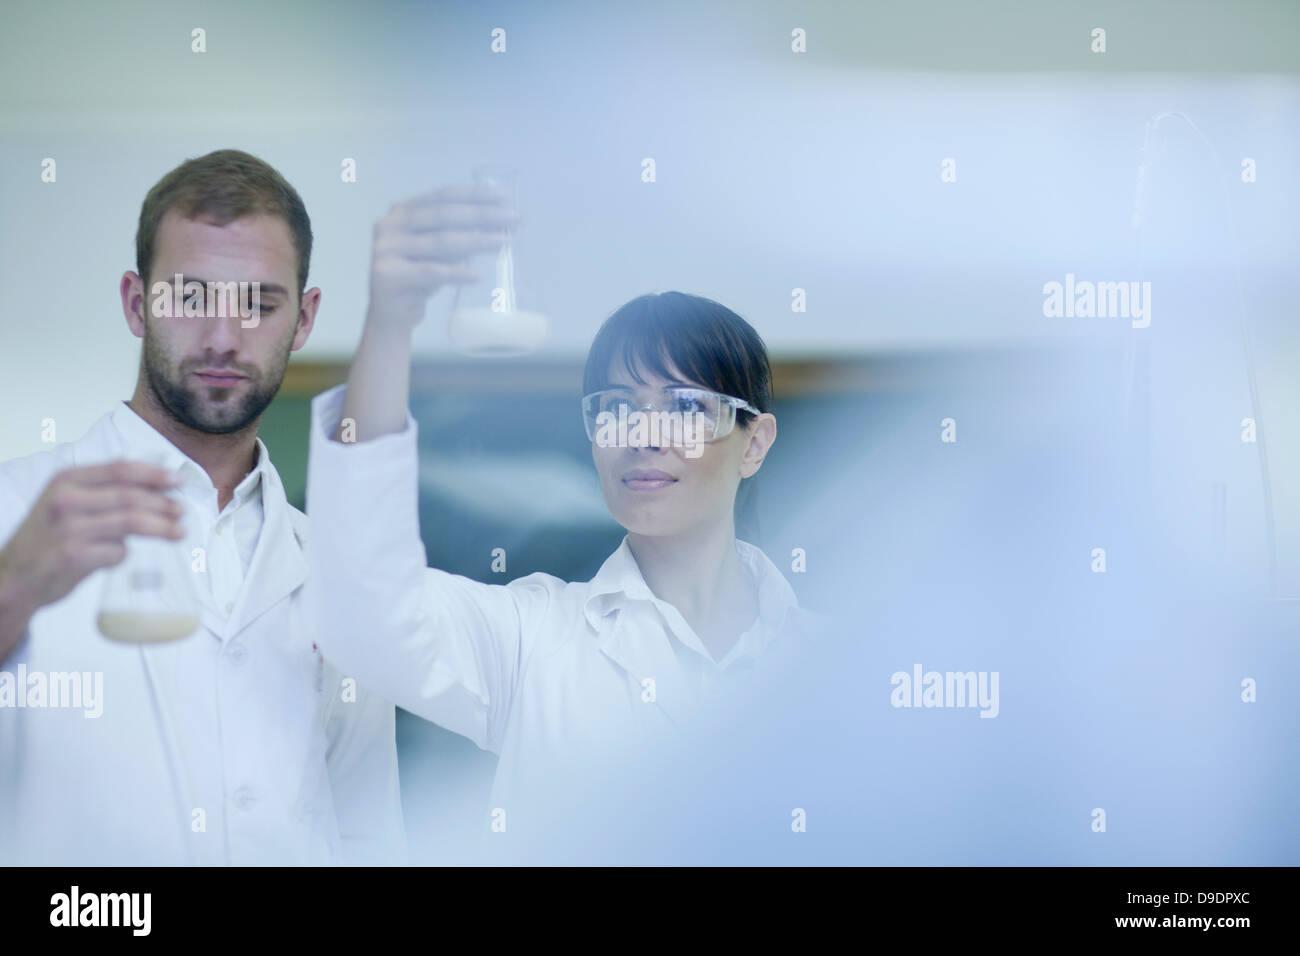 Laboratory technicians checking contents in laboratory beakers Stock Photo